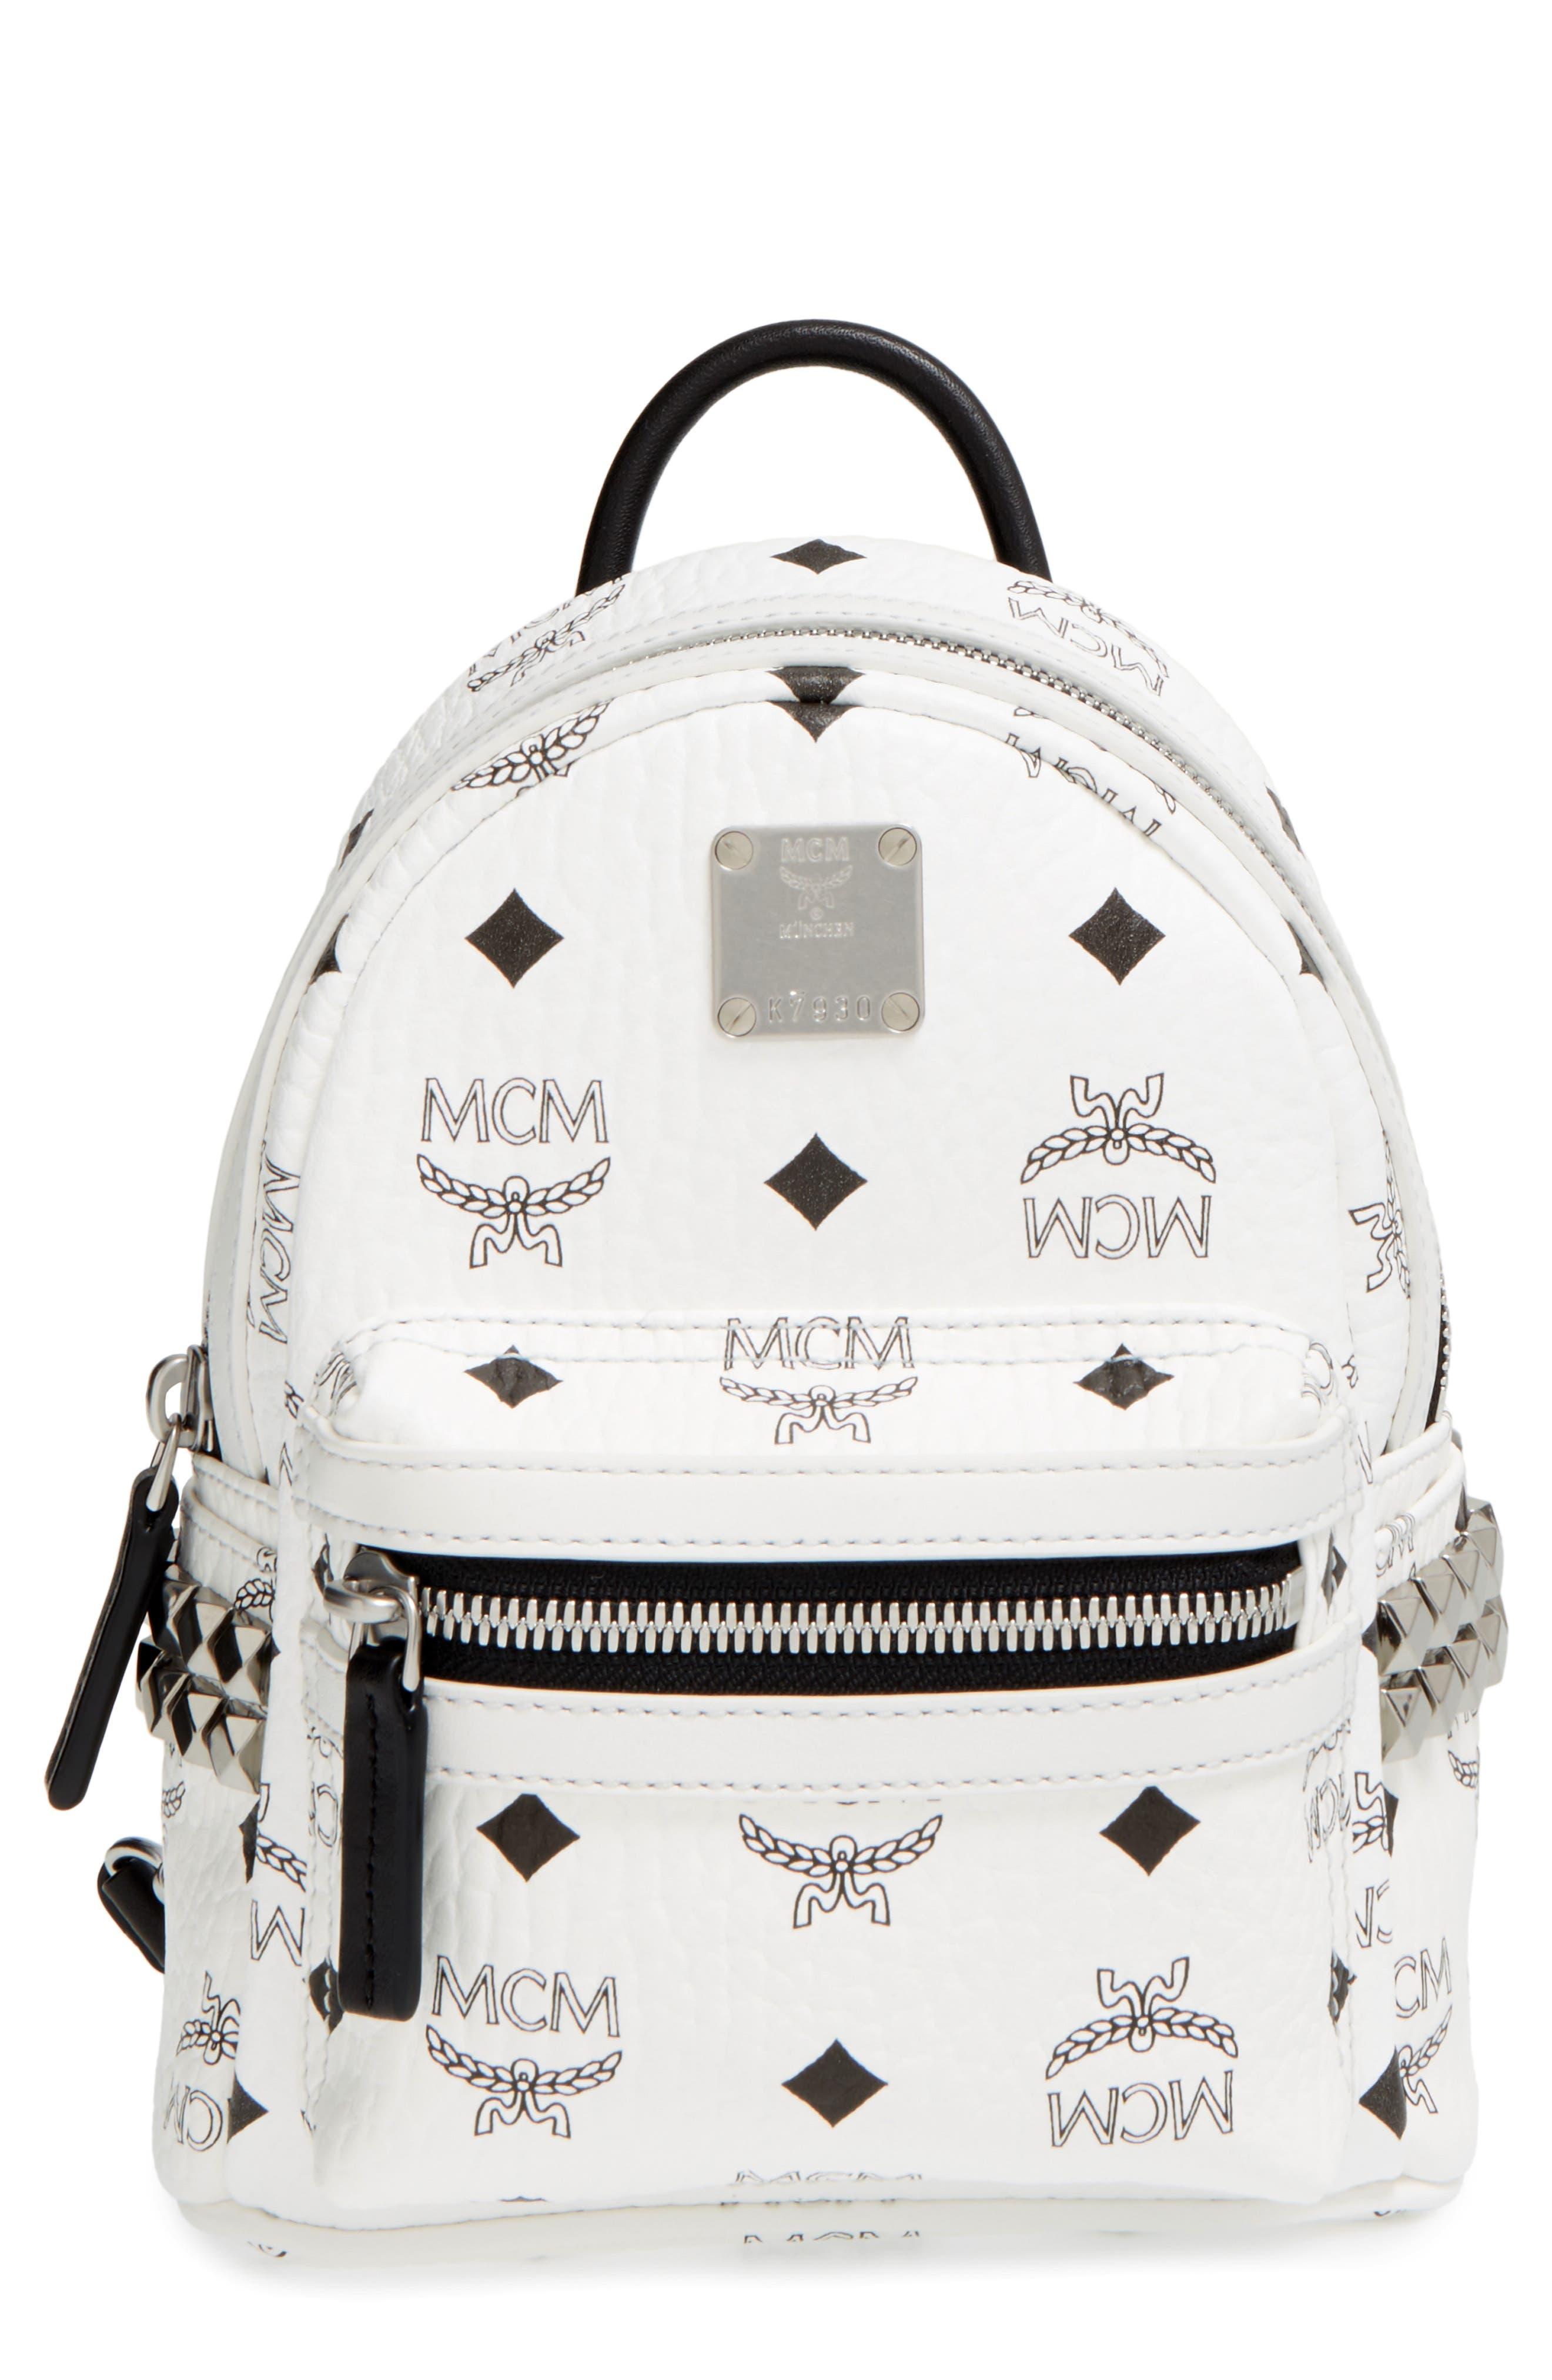 MCM 'X-Mini Stark Side Stud' Convertible Backpack, Main, color, WHITE